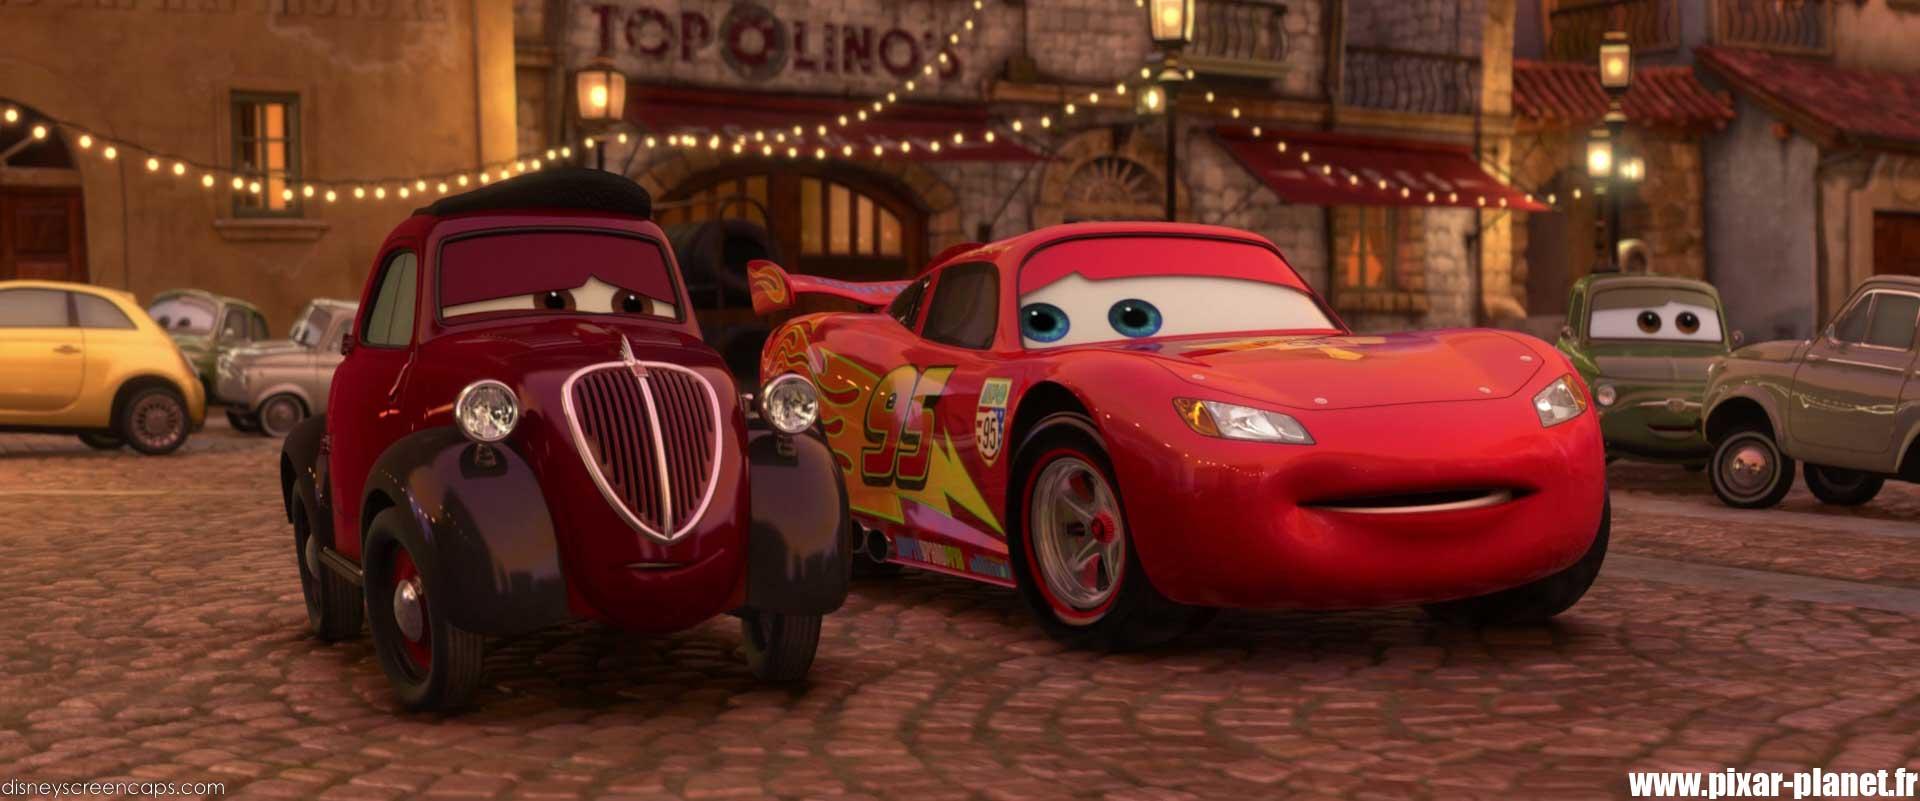 Attractive Pixar Planet Disney Cars 2